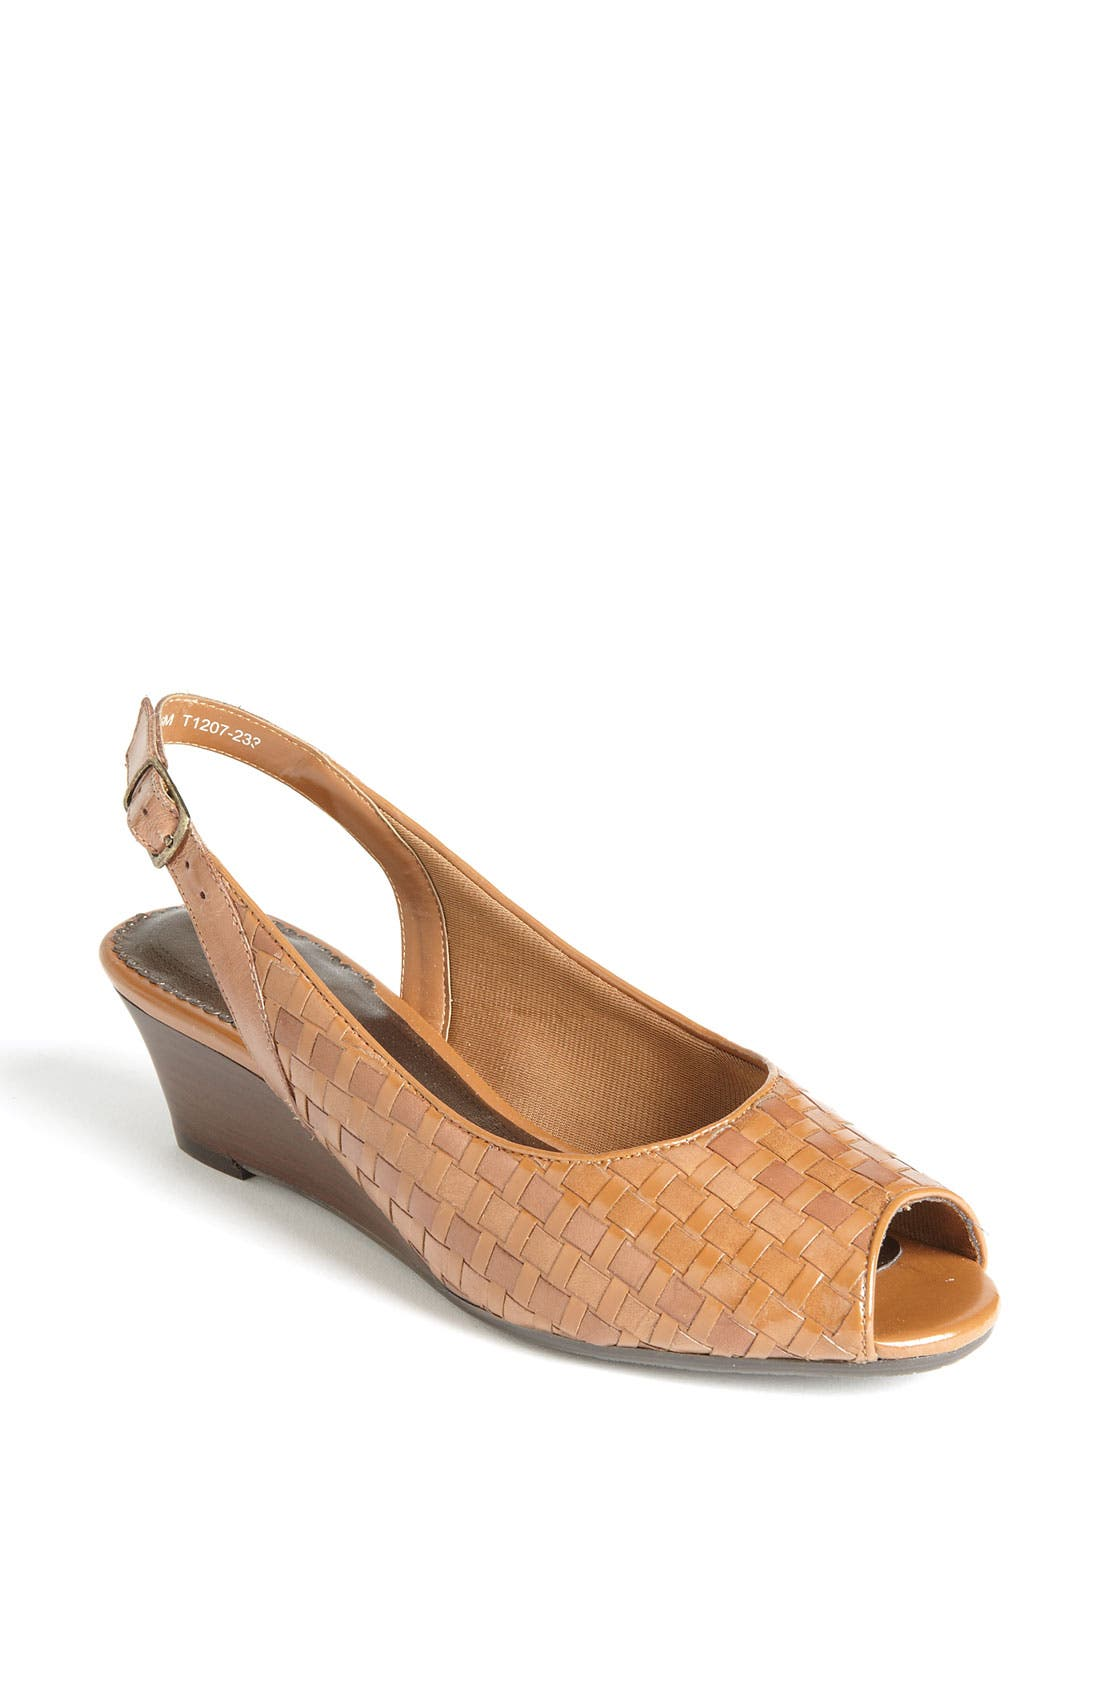 Alternate Image 1 Selected - Trotters 'Mimi' Sandal